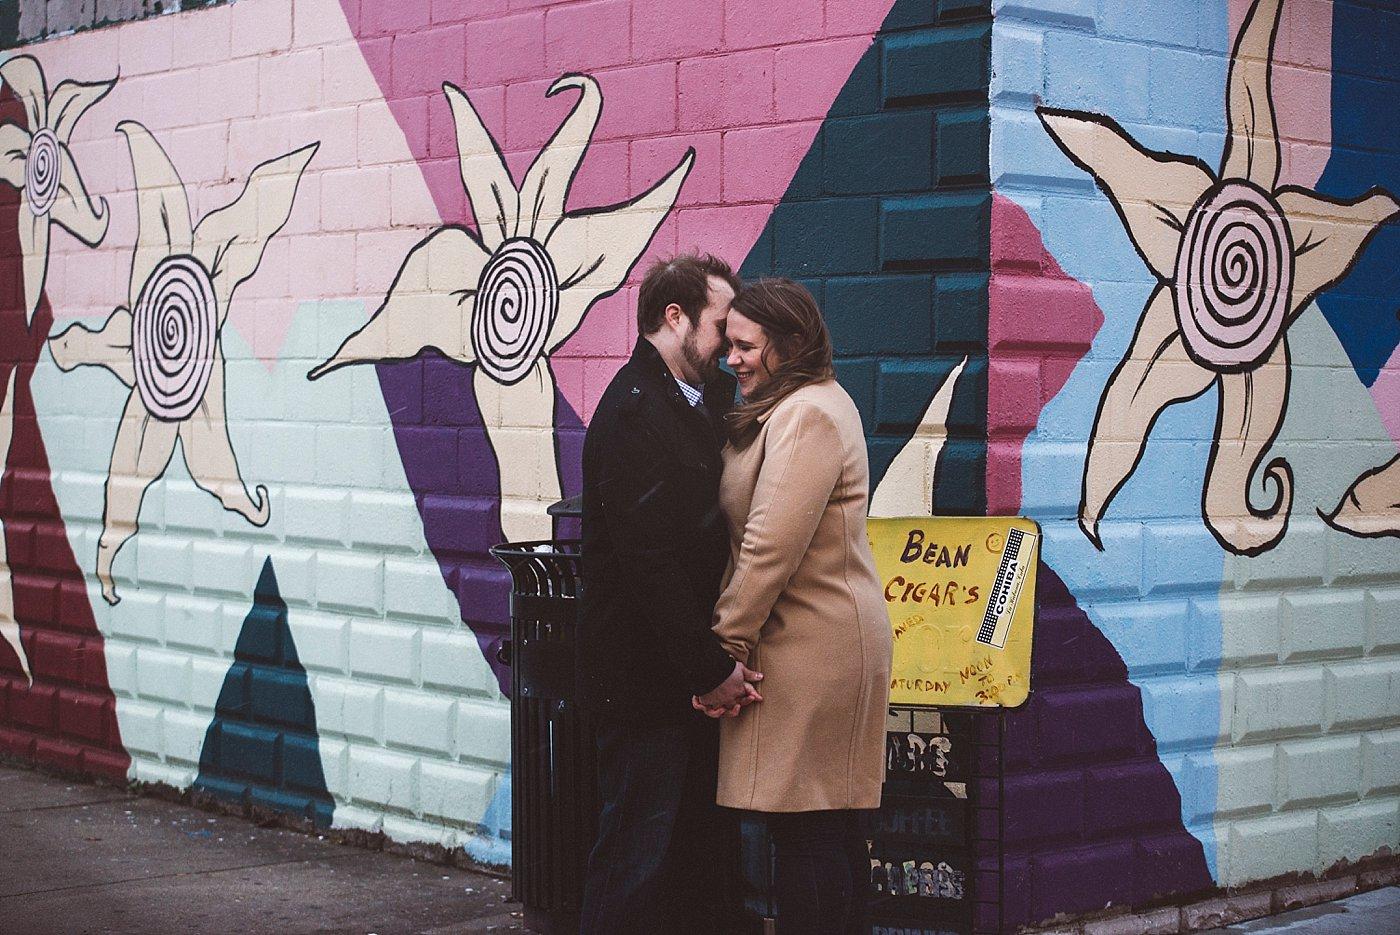 Pittsburgh Alternative Photographer | Sandrachile.com